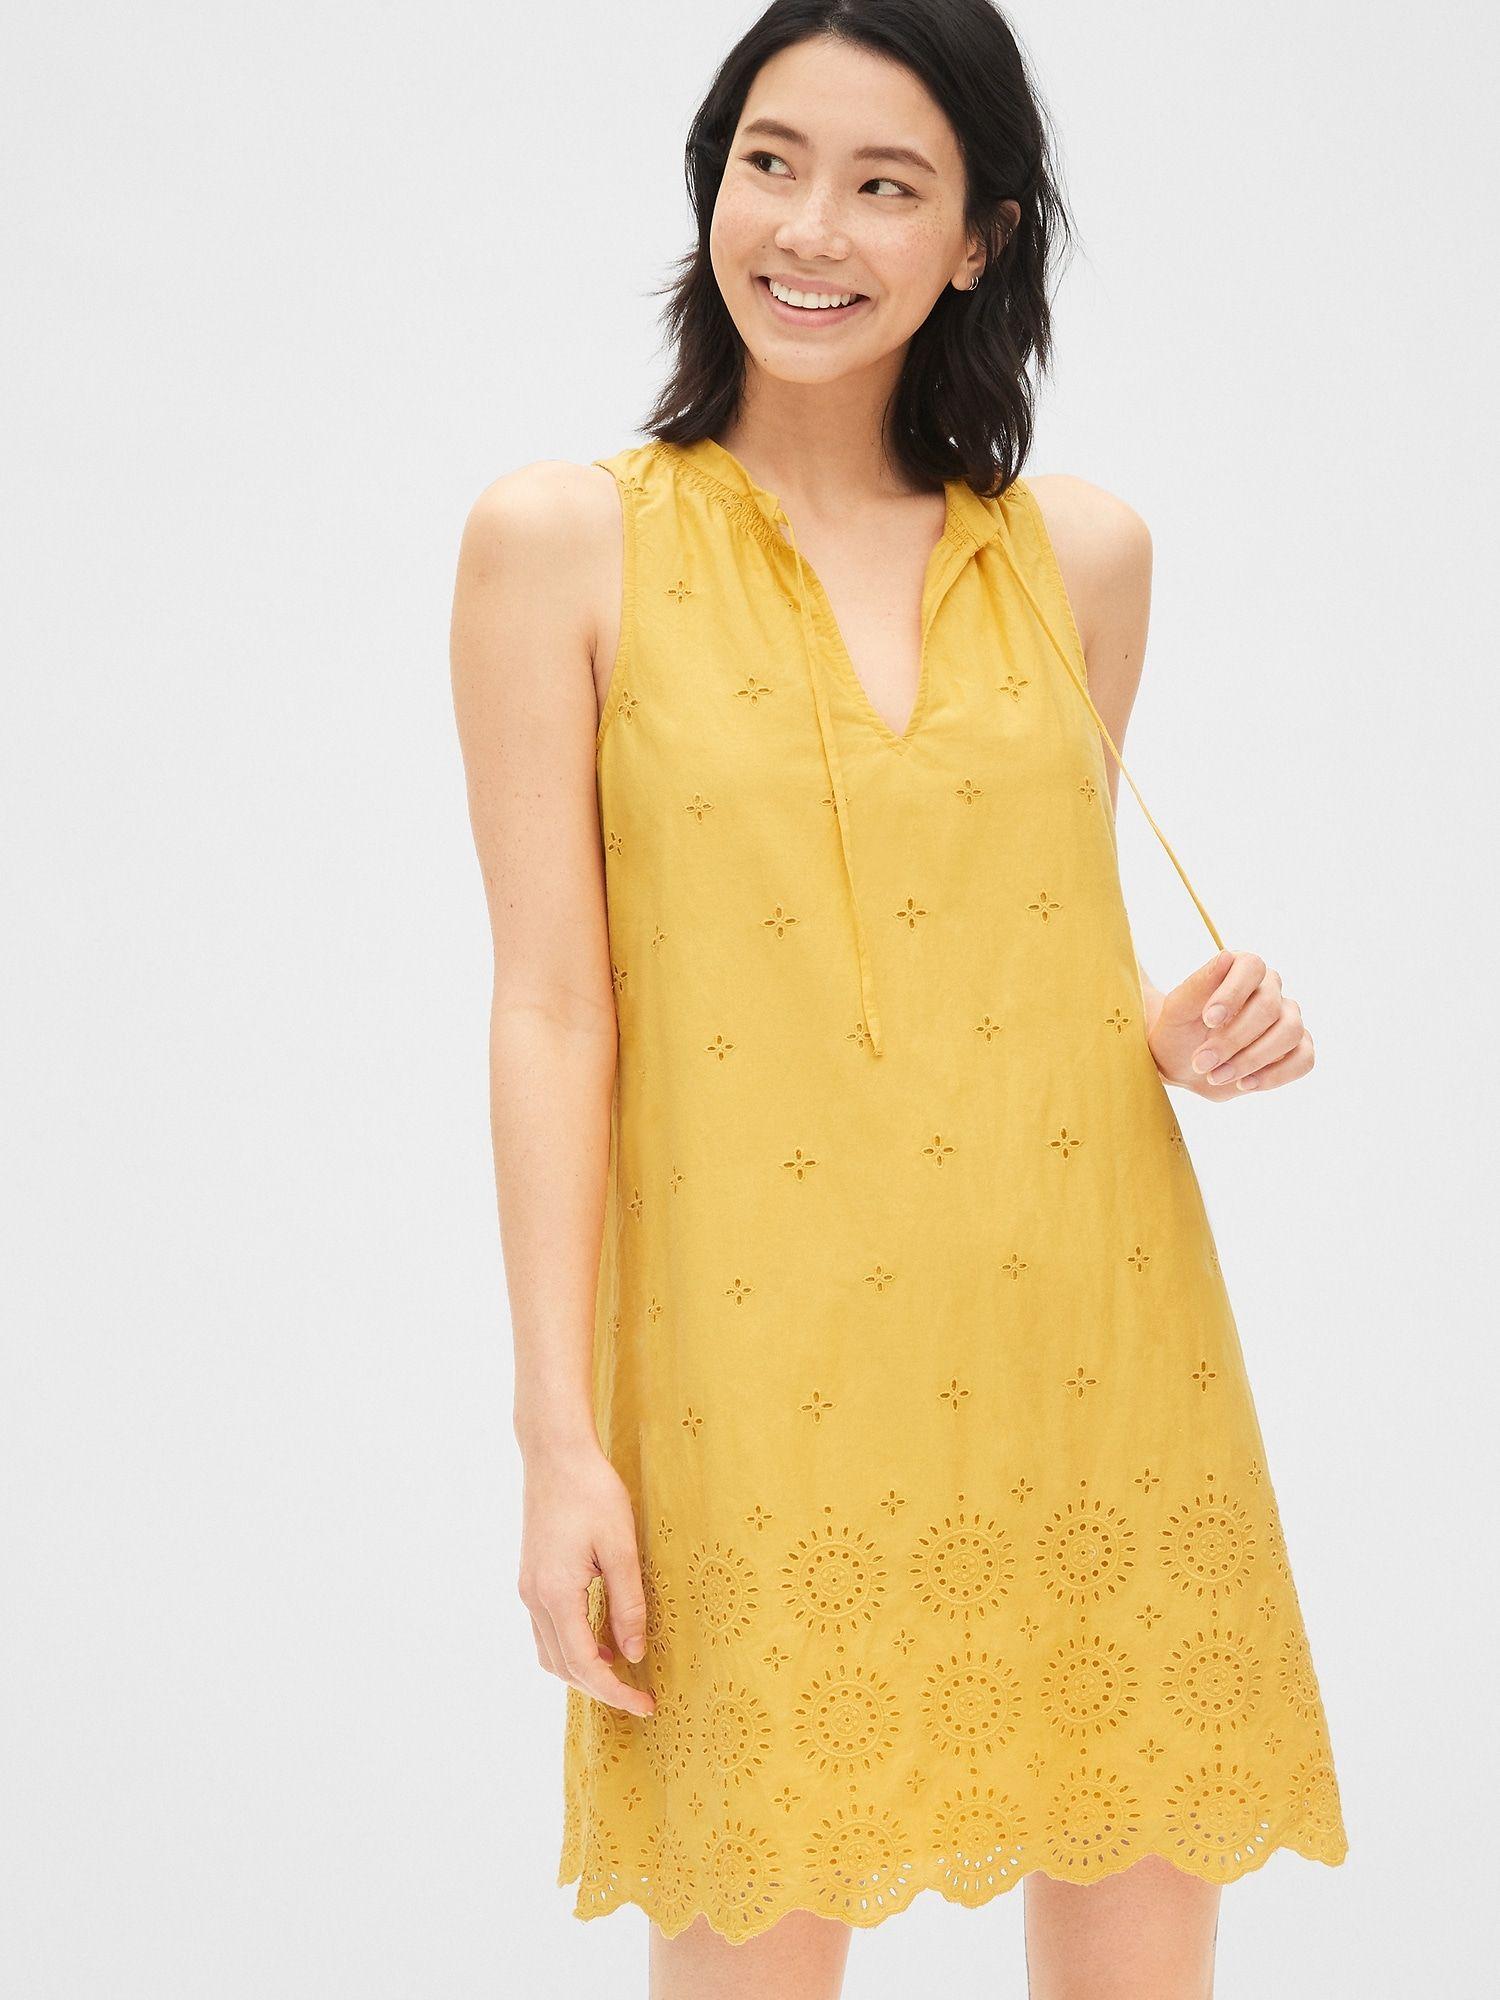 Eyelet Embroidered Sleeveless Tie Neck Swing Dress Gap Attractive Dresses Womens Dresses Summer Dresses For Women [ 2000 x 1500 Pixel ]